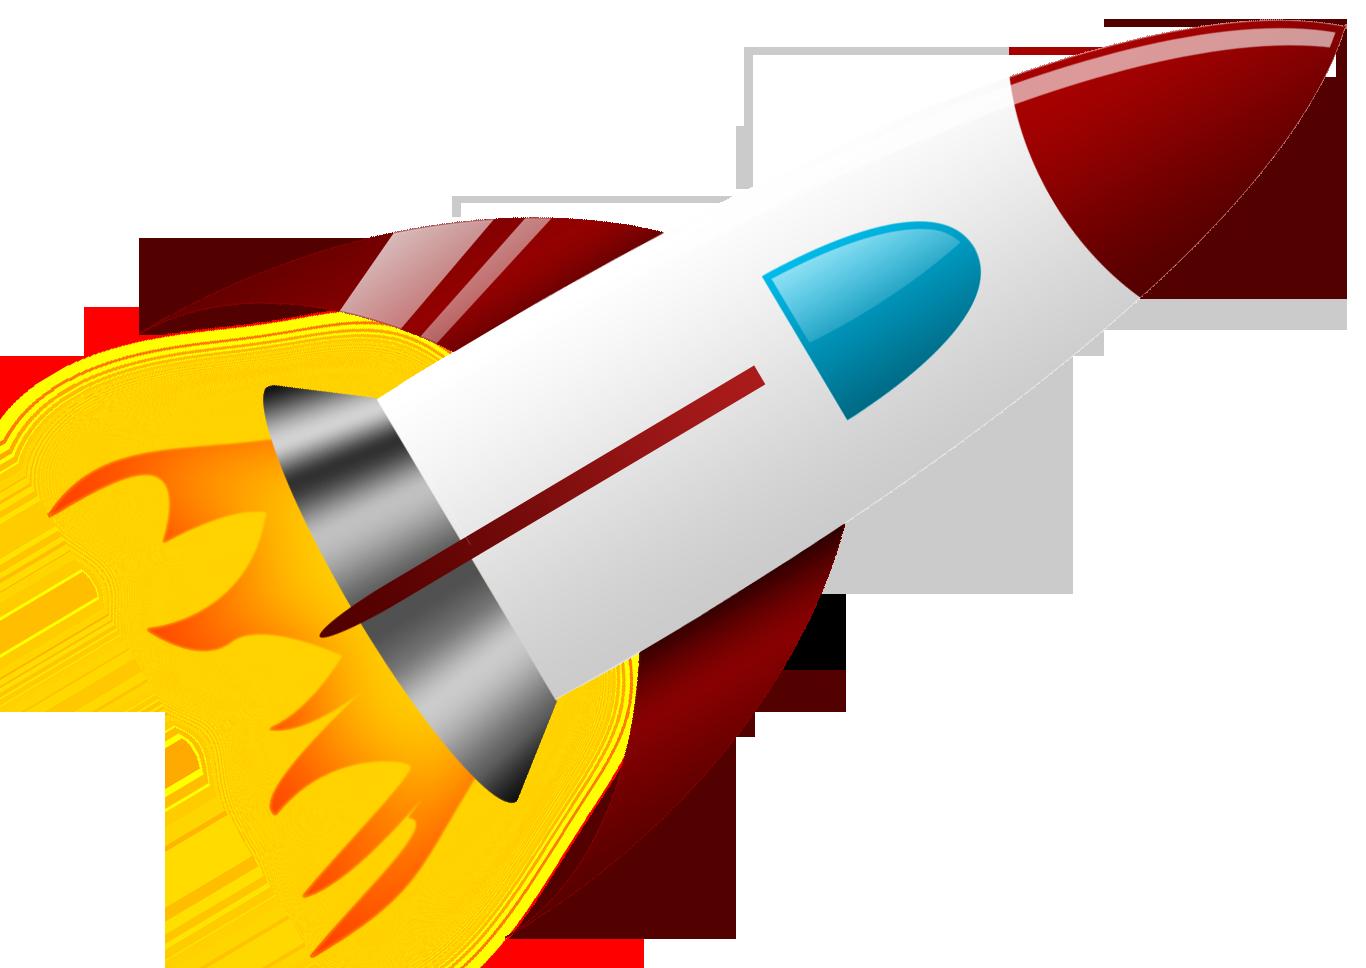 Png image purepng free. Clipart flames rocket